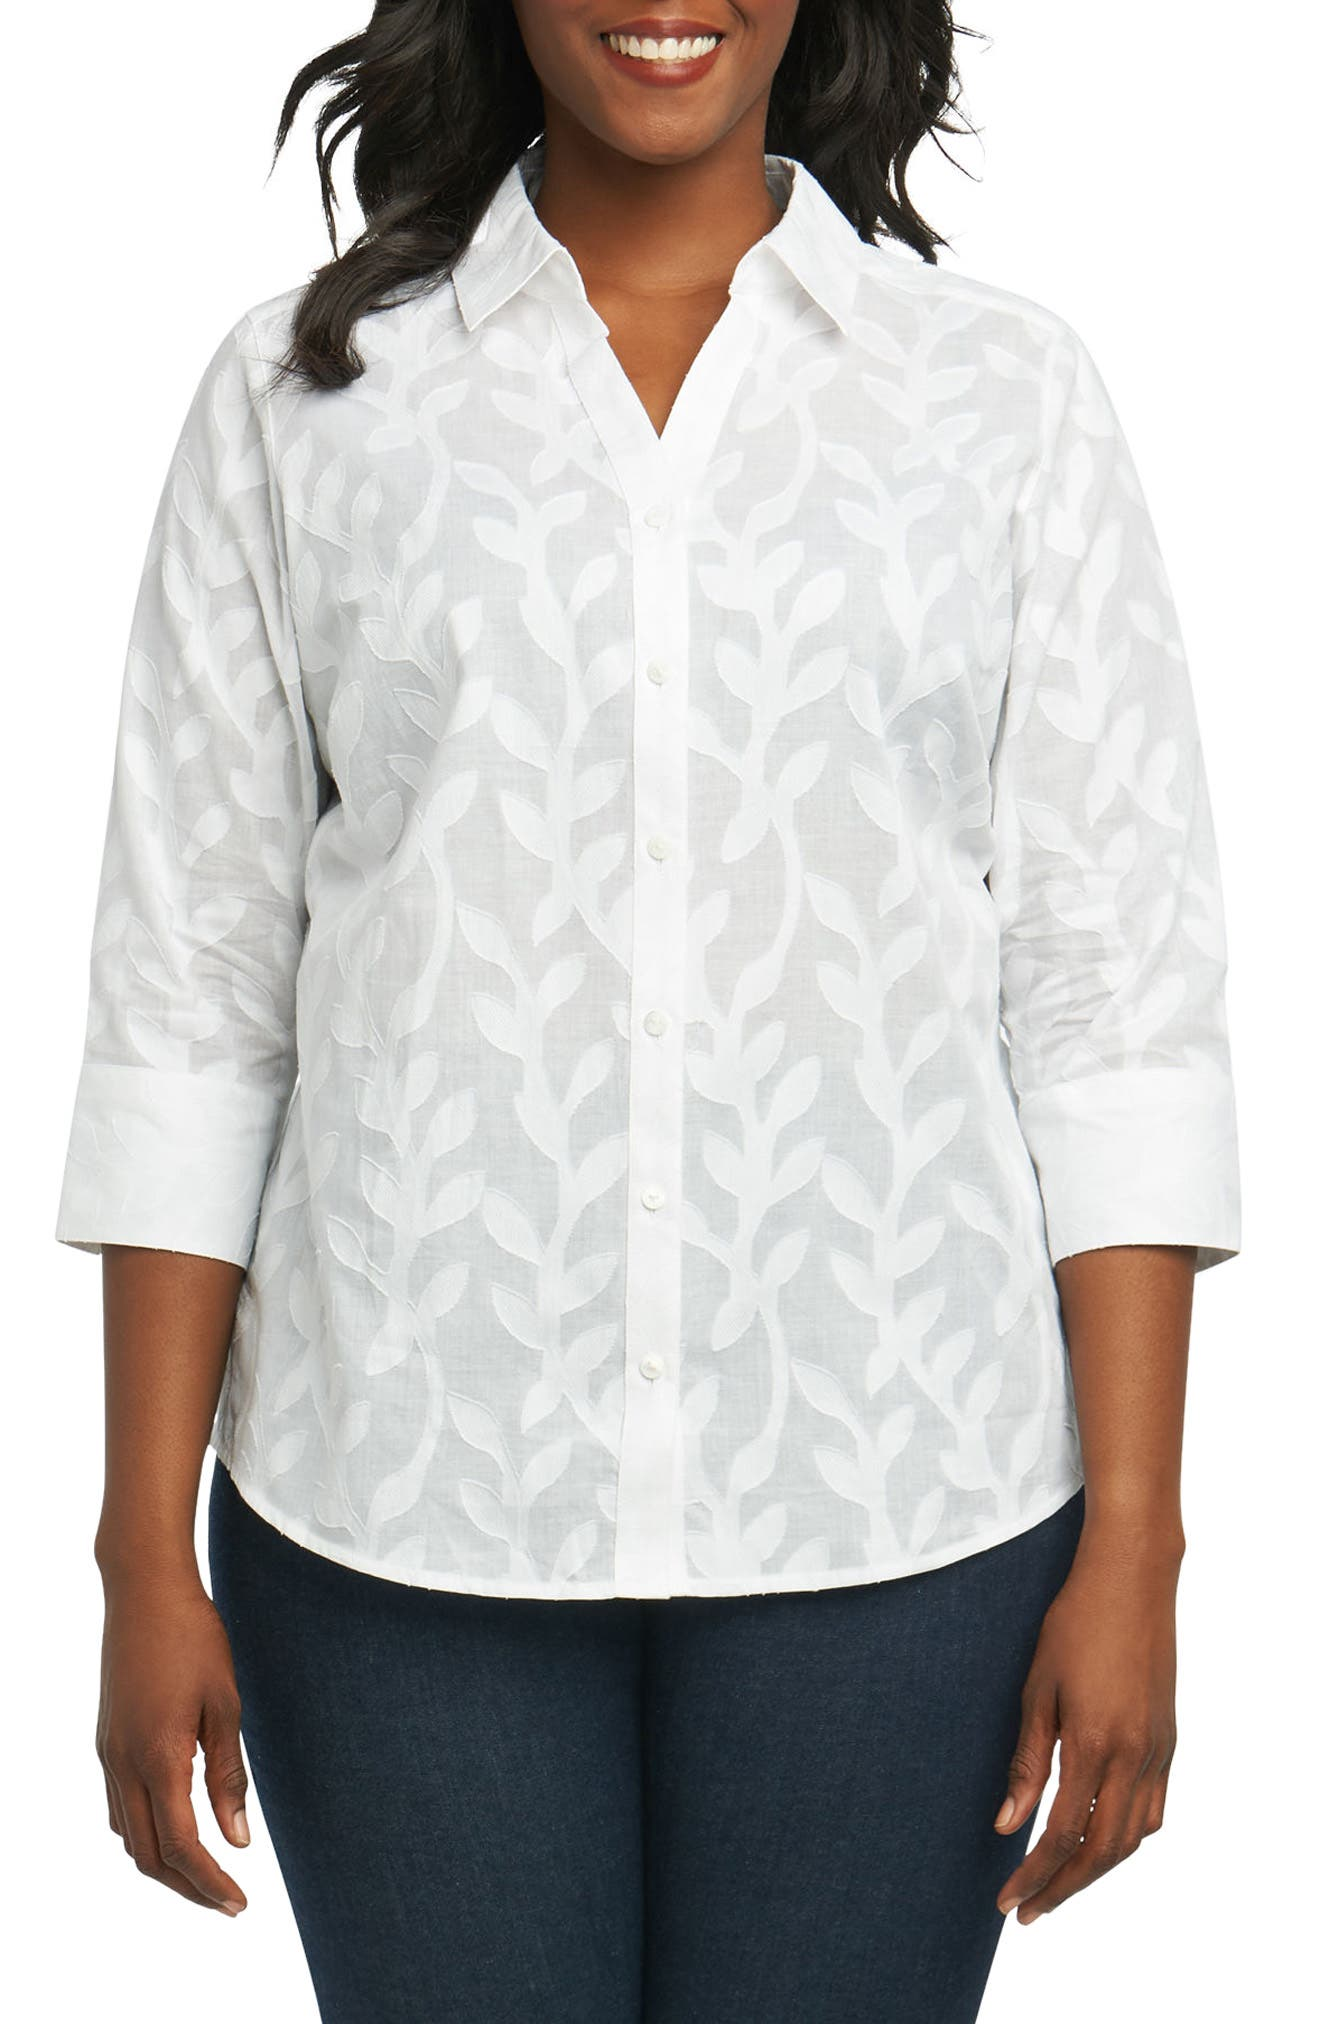 Mary Palm Jacquard Shirt,                             Main thumbnail 1, color,                             White